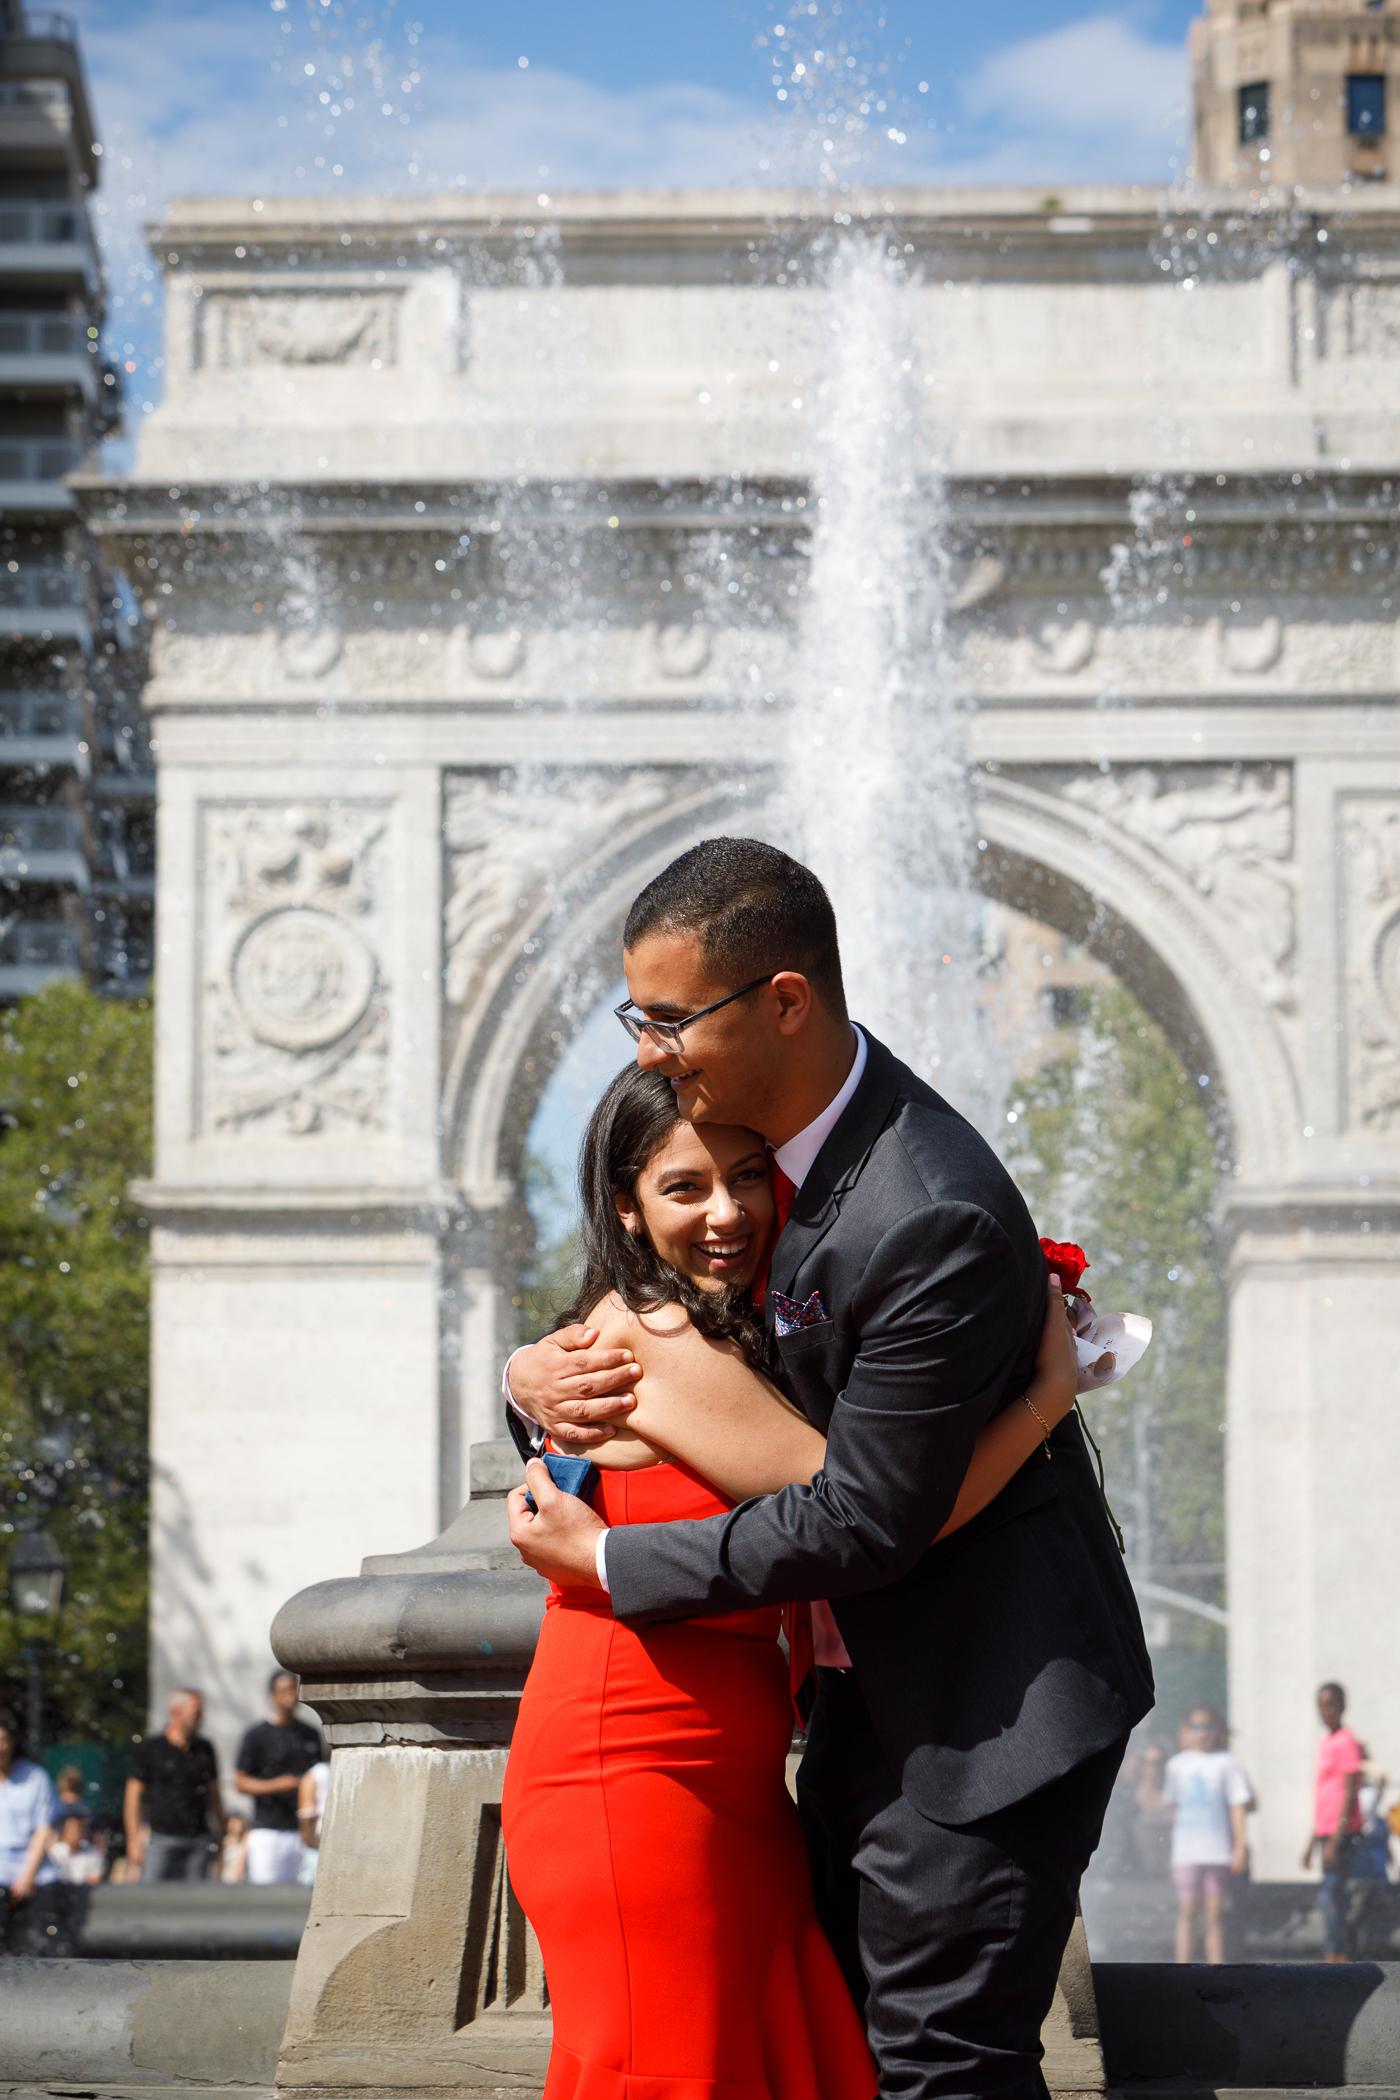 Kiro Rebecca Washington Square Park Marriage Proposal _ Jonathan Heisler _ 6152019 _025.jpg